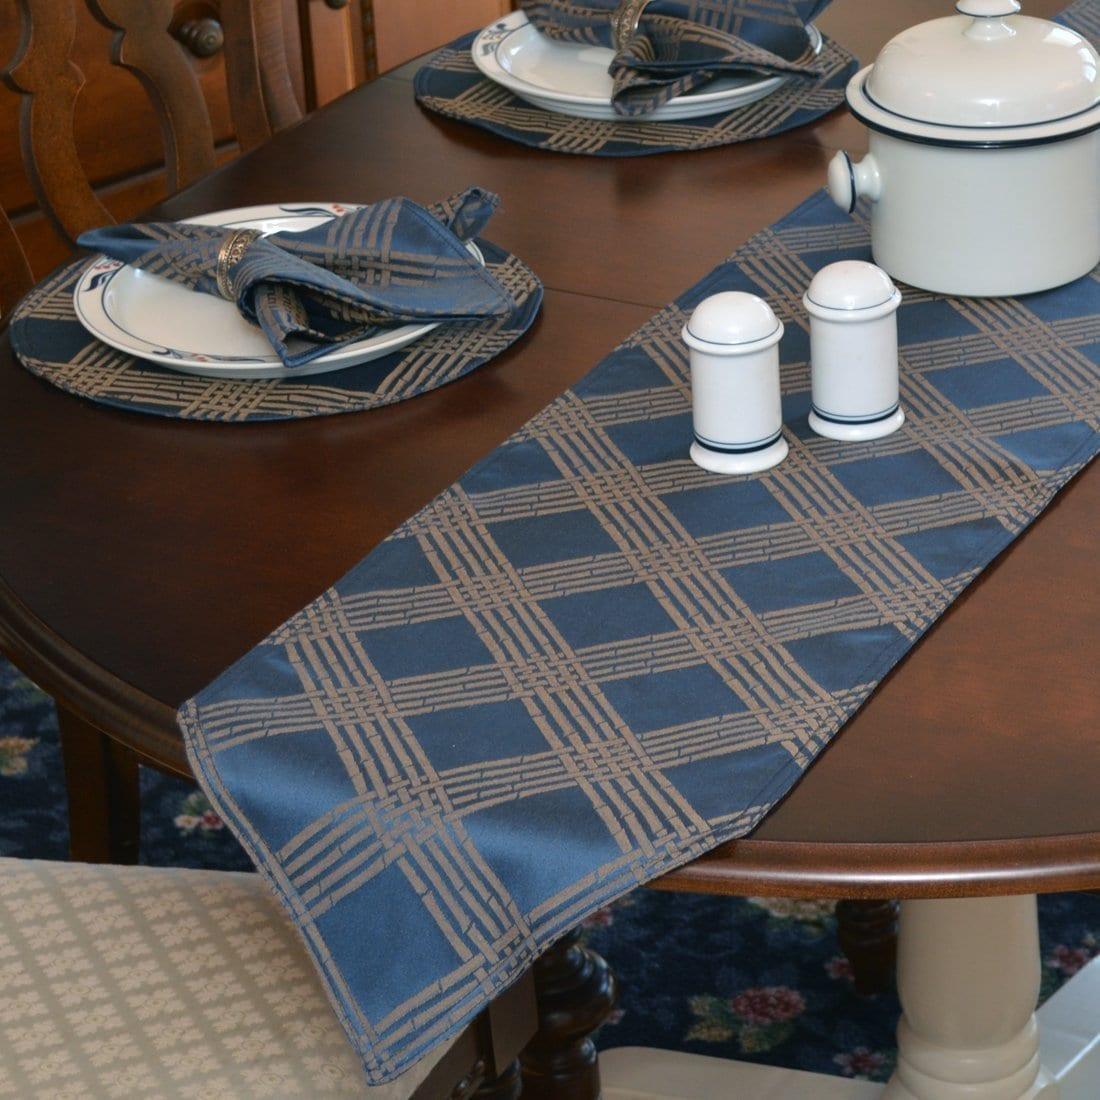 Sweet Pea Linens - Dark Blue Lattice Jacquard 72 inch Table Runner (SKU#: R-1024-L24) - Table Setting